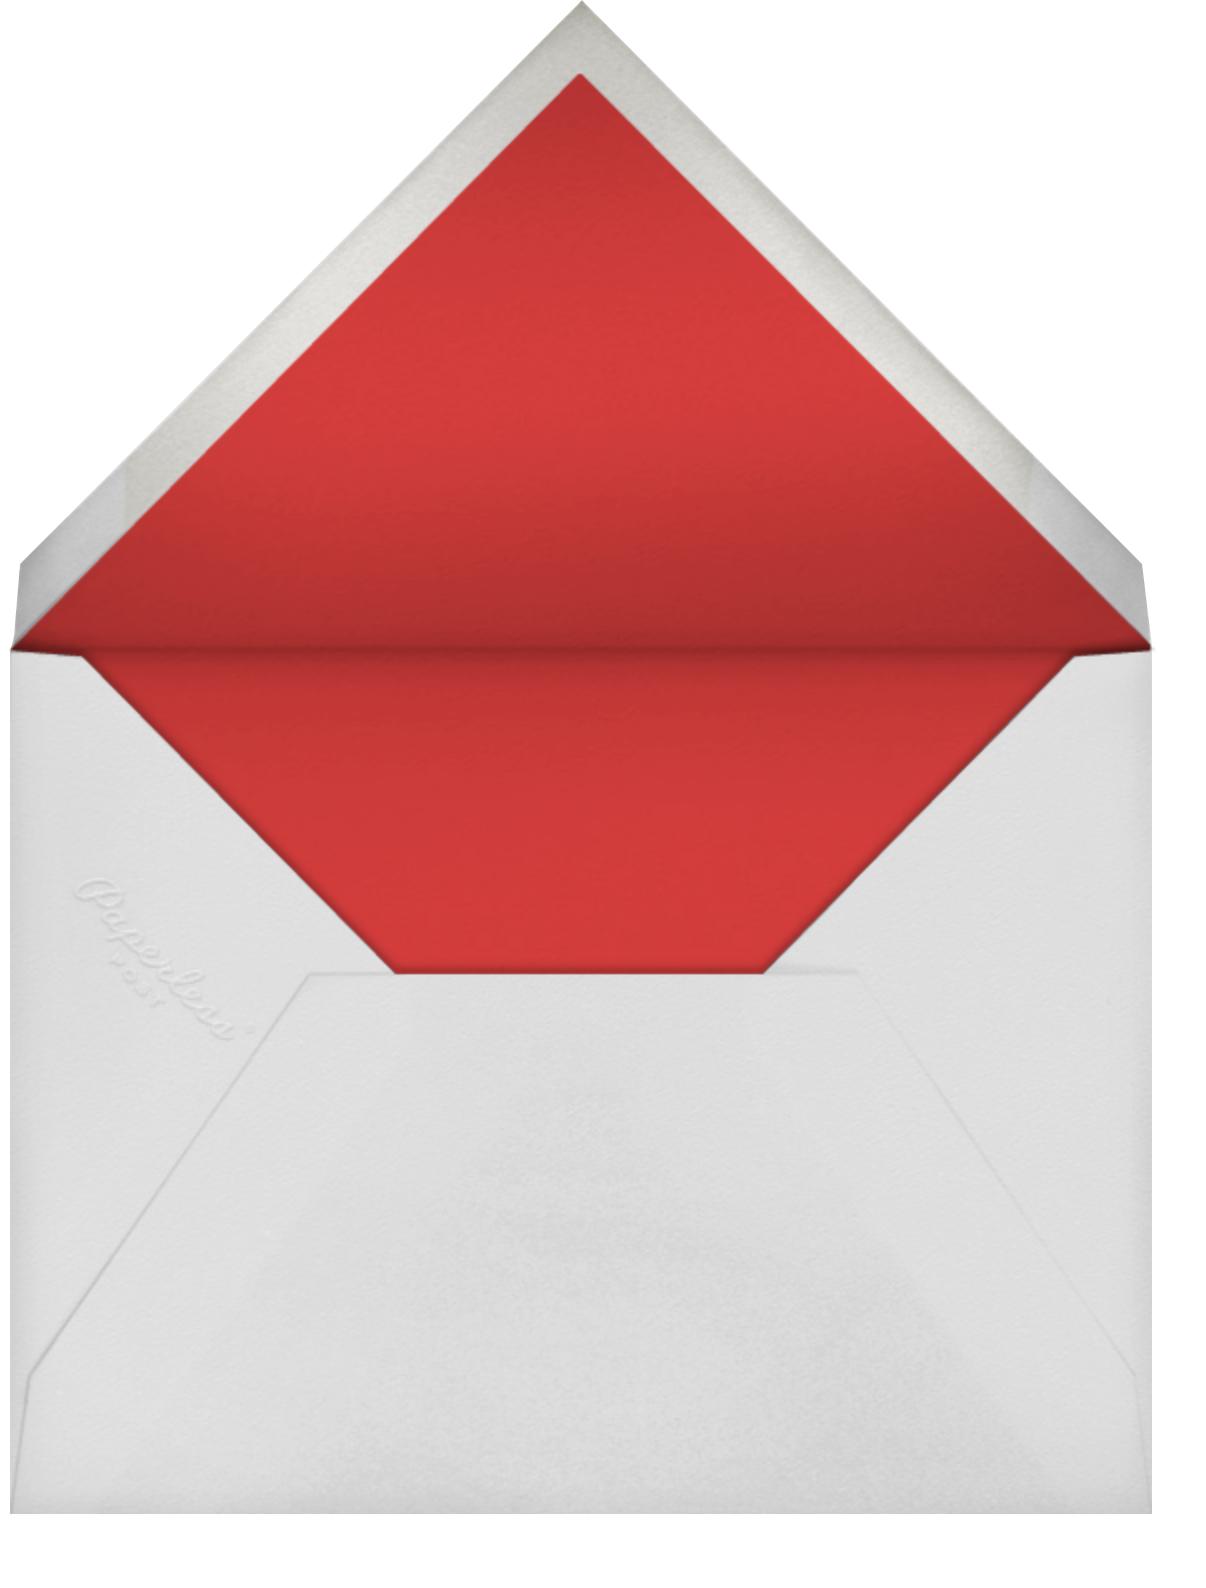 Hot Dotties - kate spade new york - Christmas party - envelope back